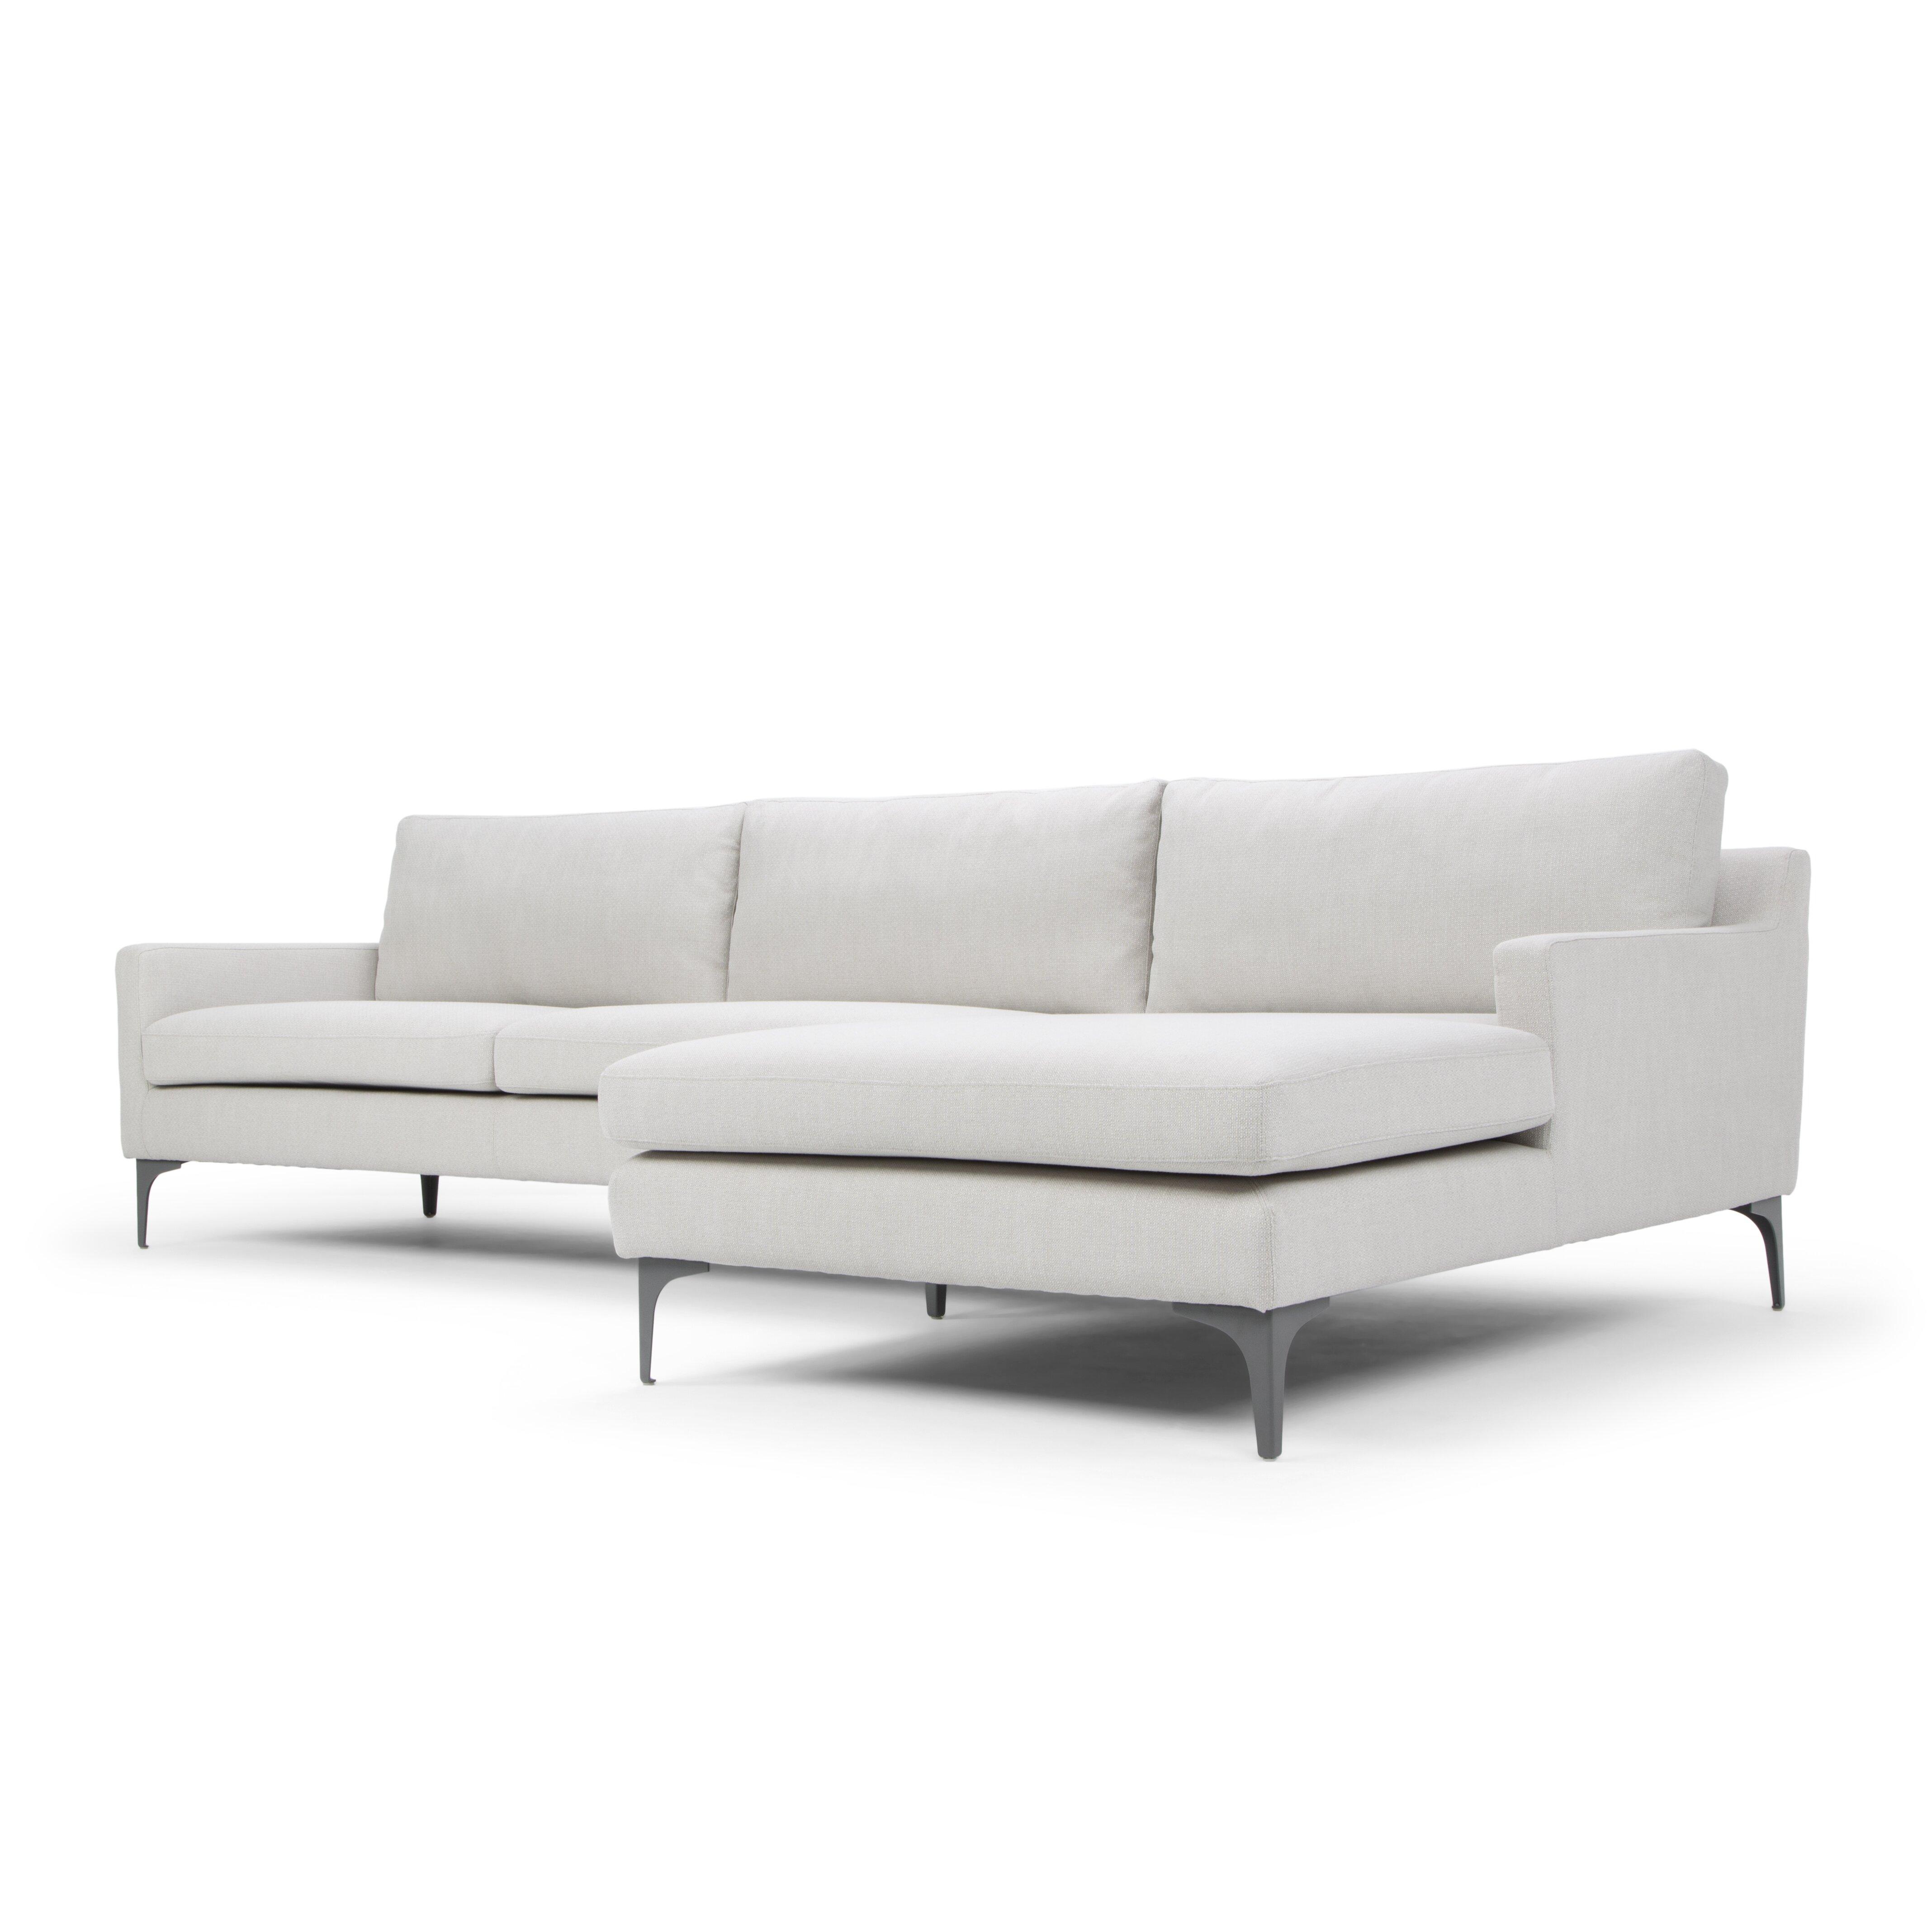 Nordic upholstery ingrid sectional sofa wayfair for Wayfair sectional sofa